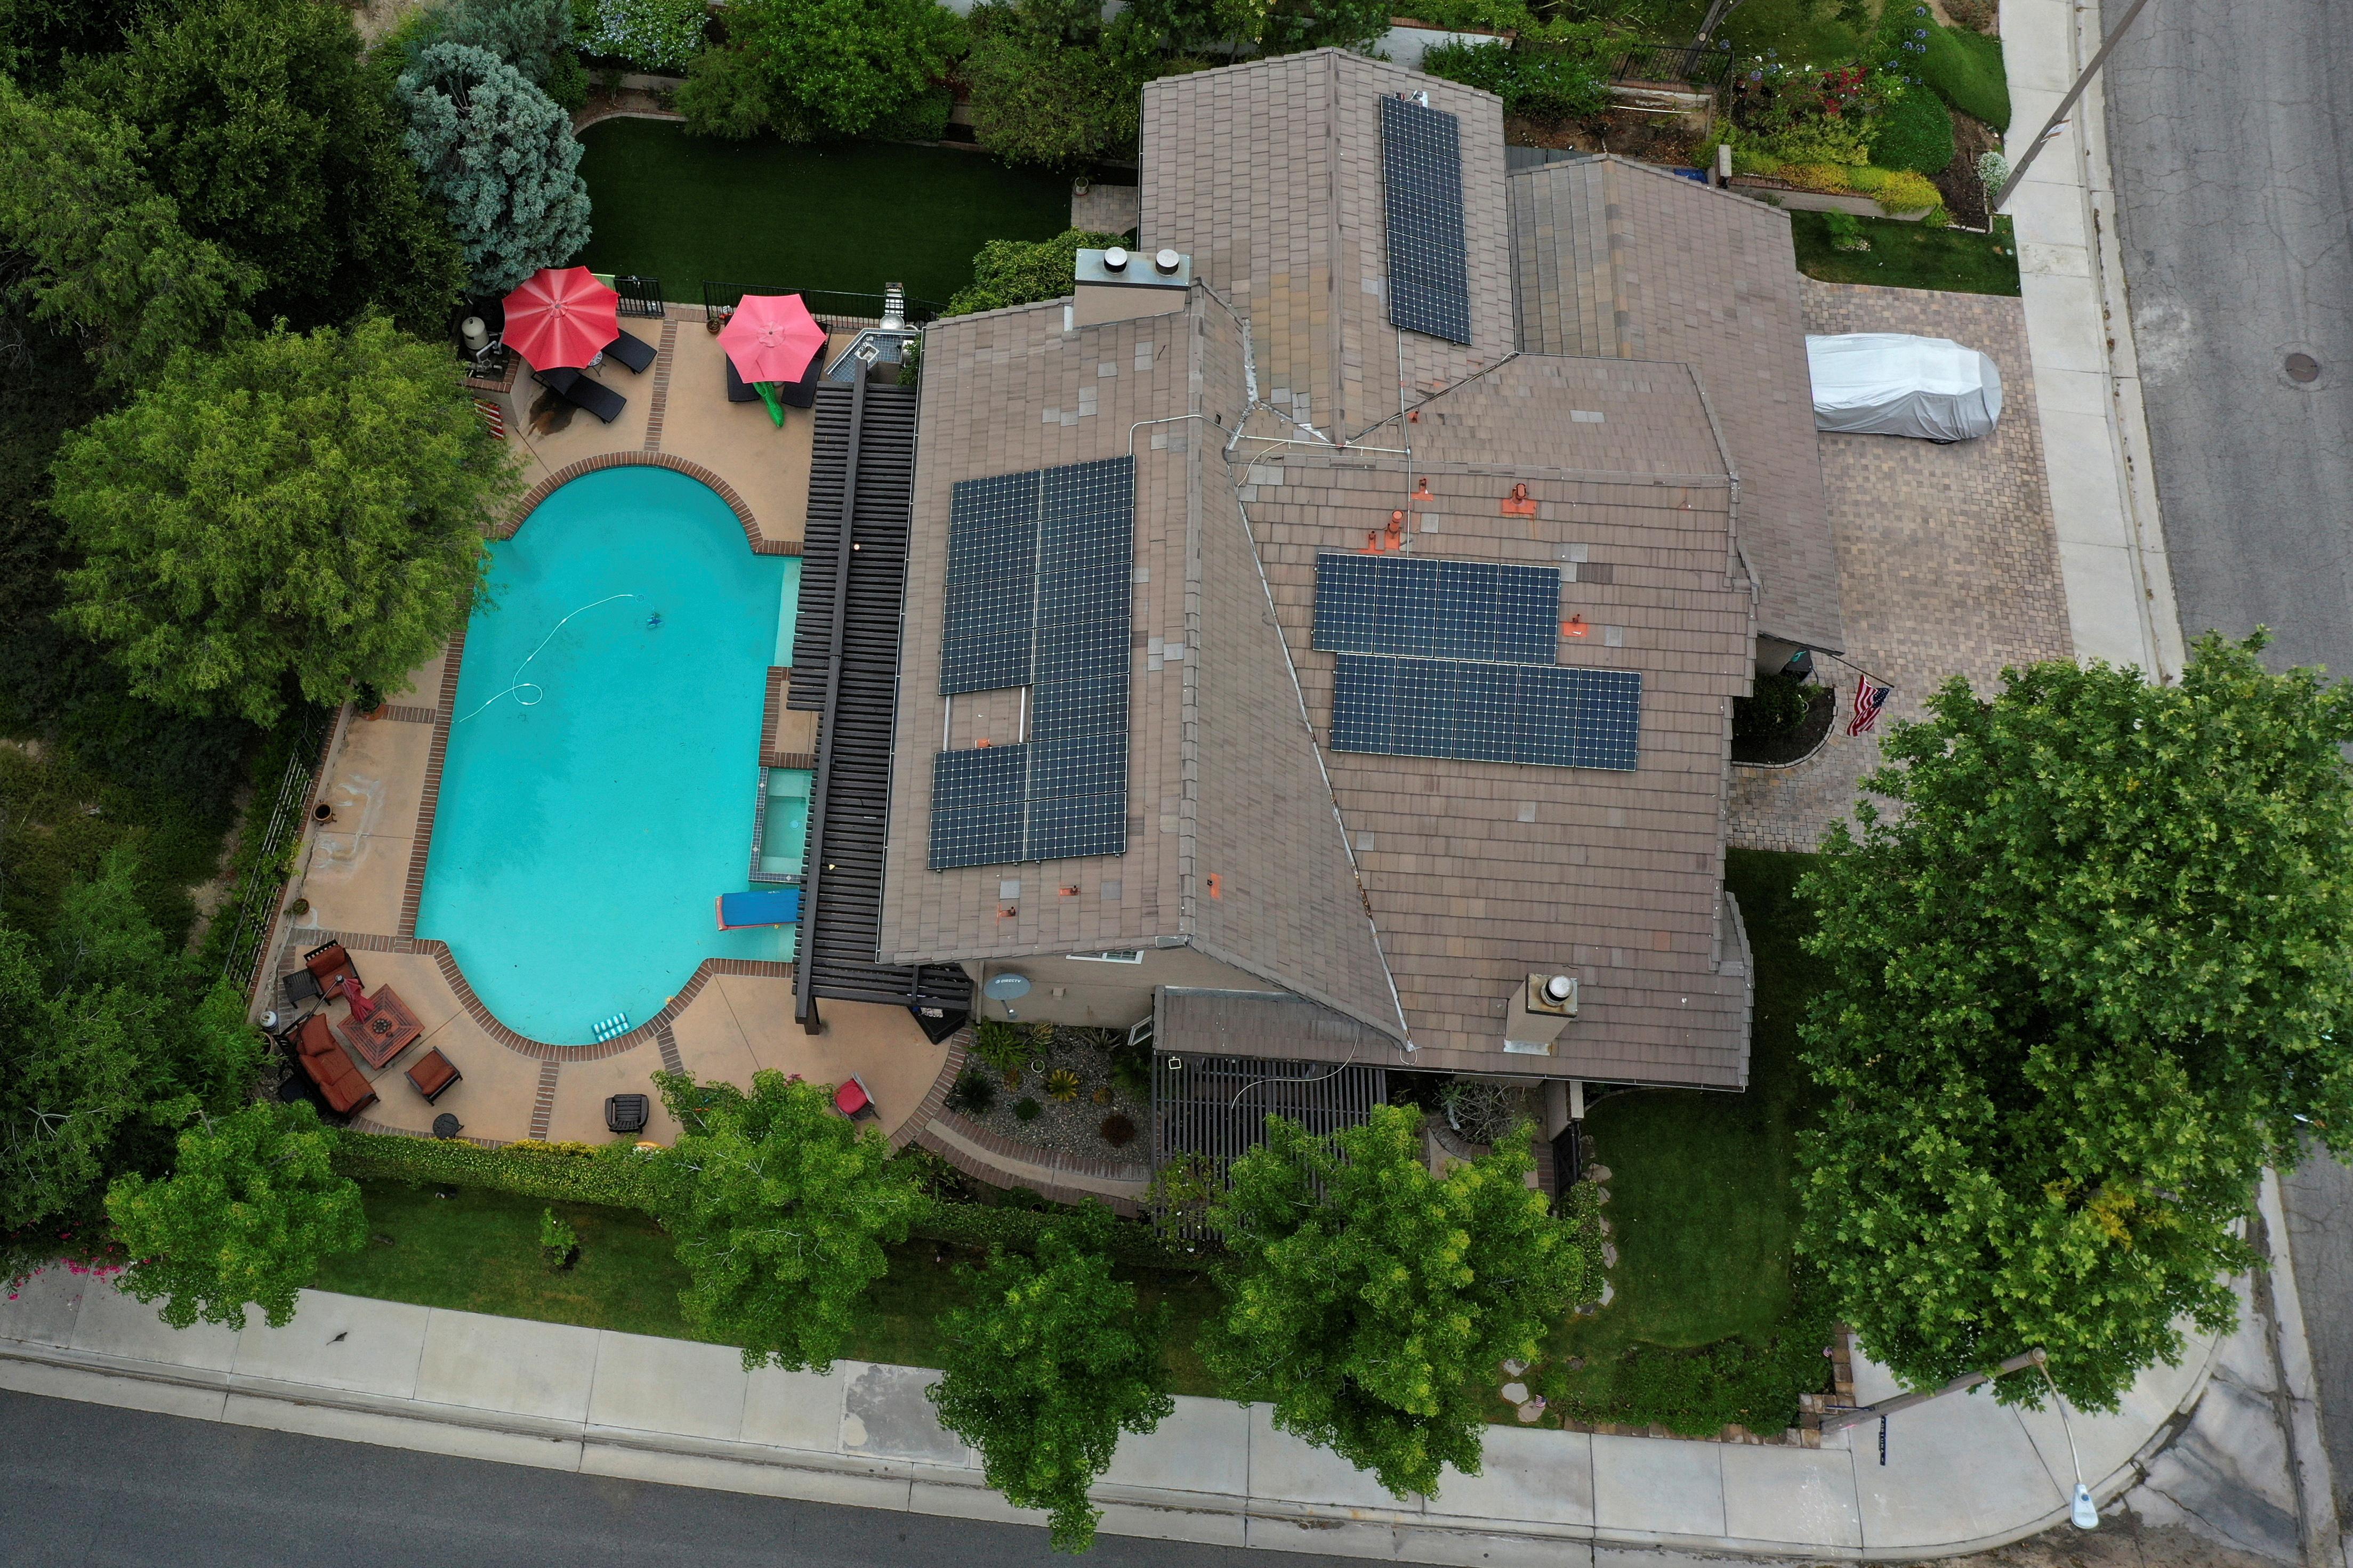 Solar panels are seen on rooftops amid the coronavirus disease (COVID-19) outbreak, in Santa Clarita, near Los Angeles, California, U.S., June 18, 2020.  REUTERS/Lucy Nicholson/File Photo